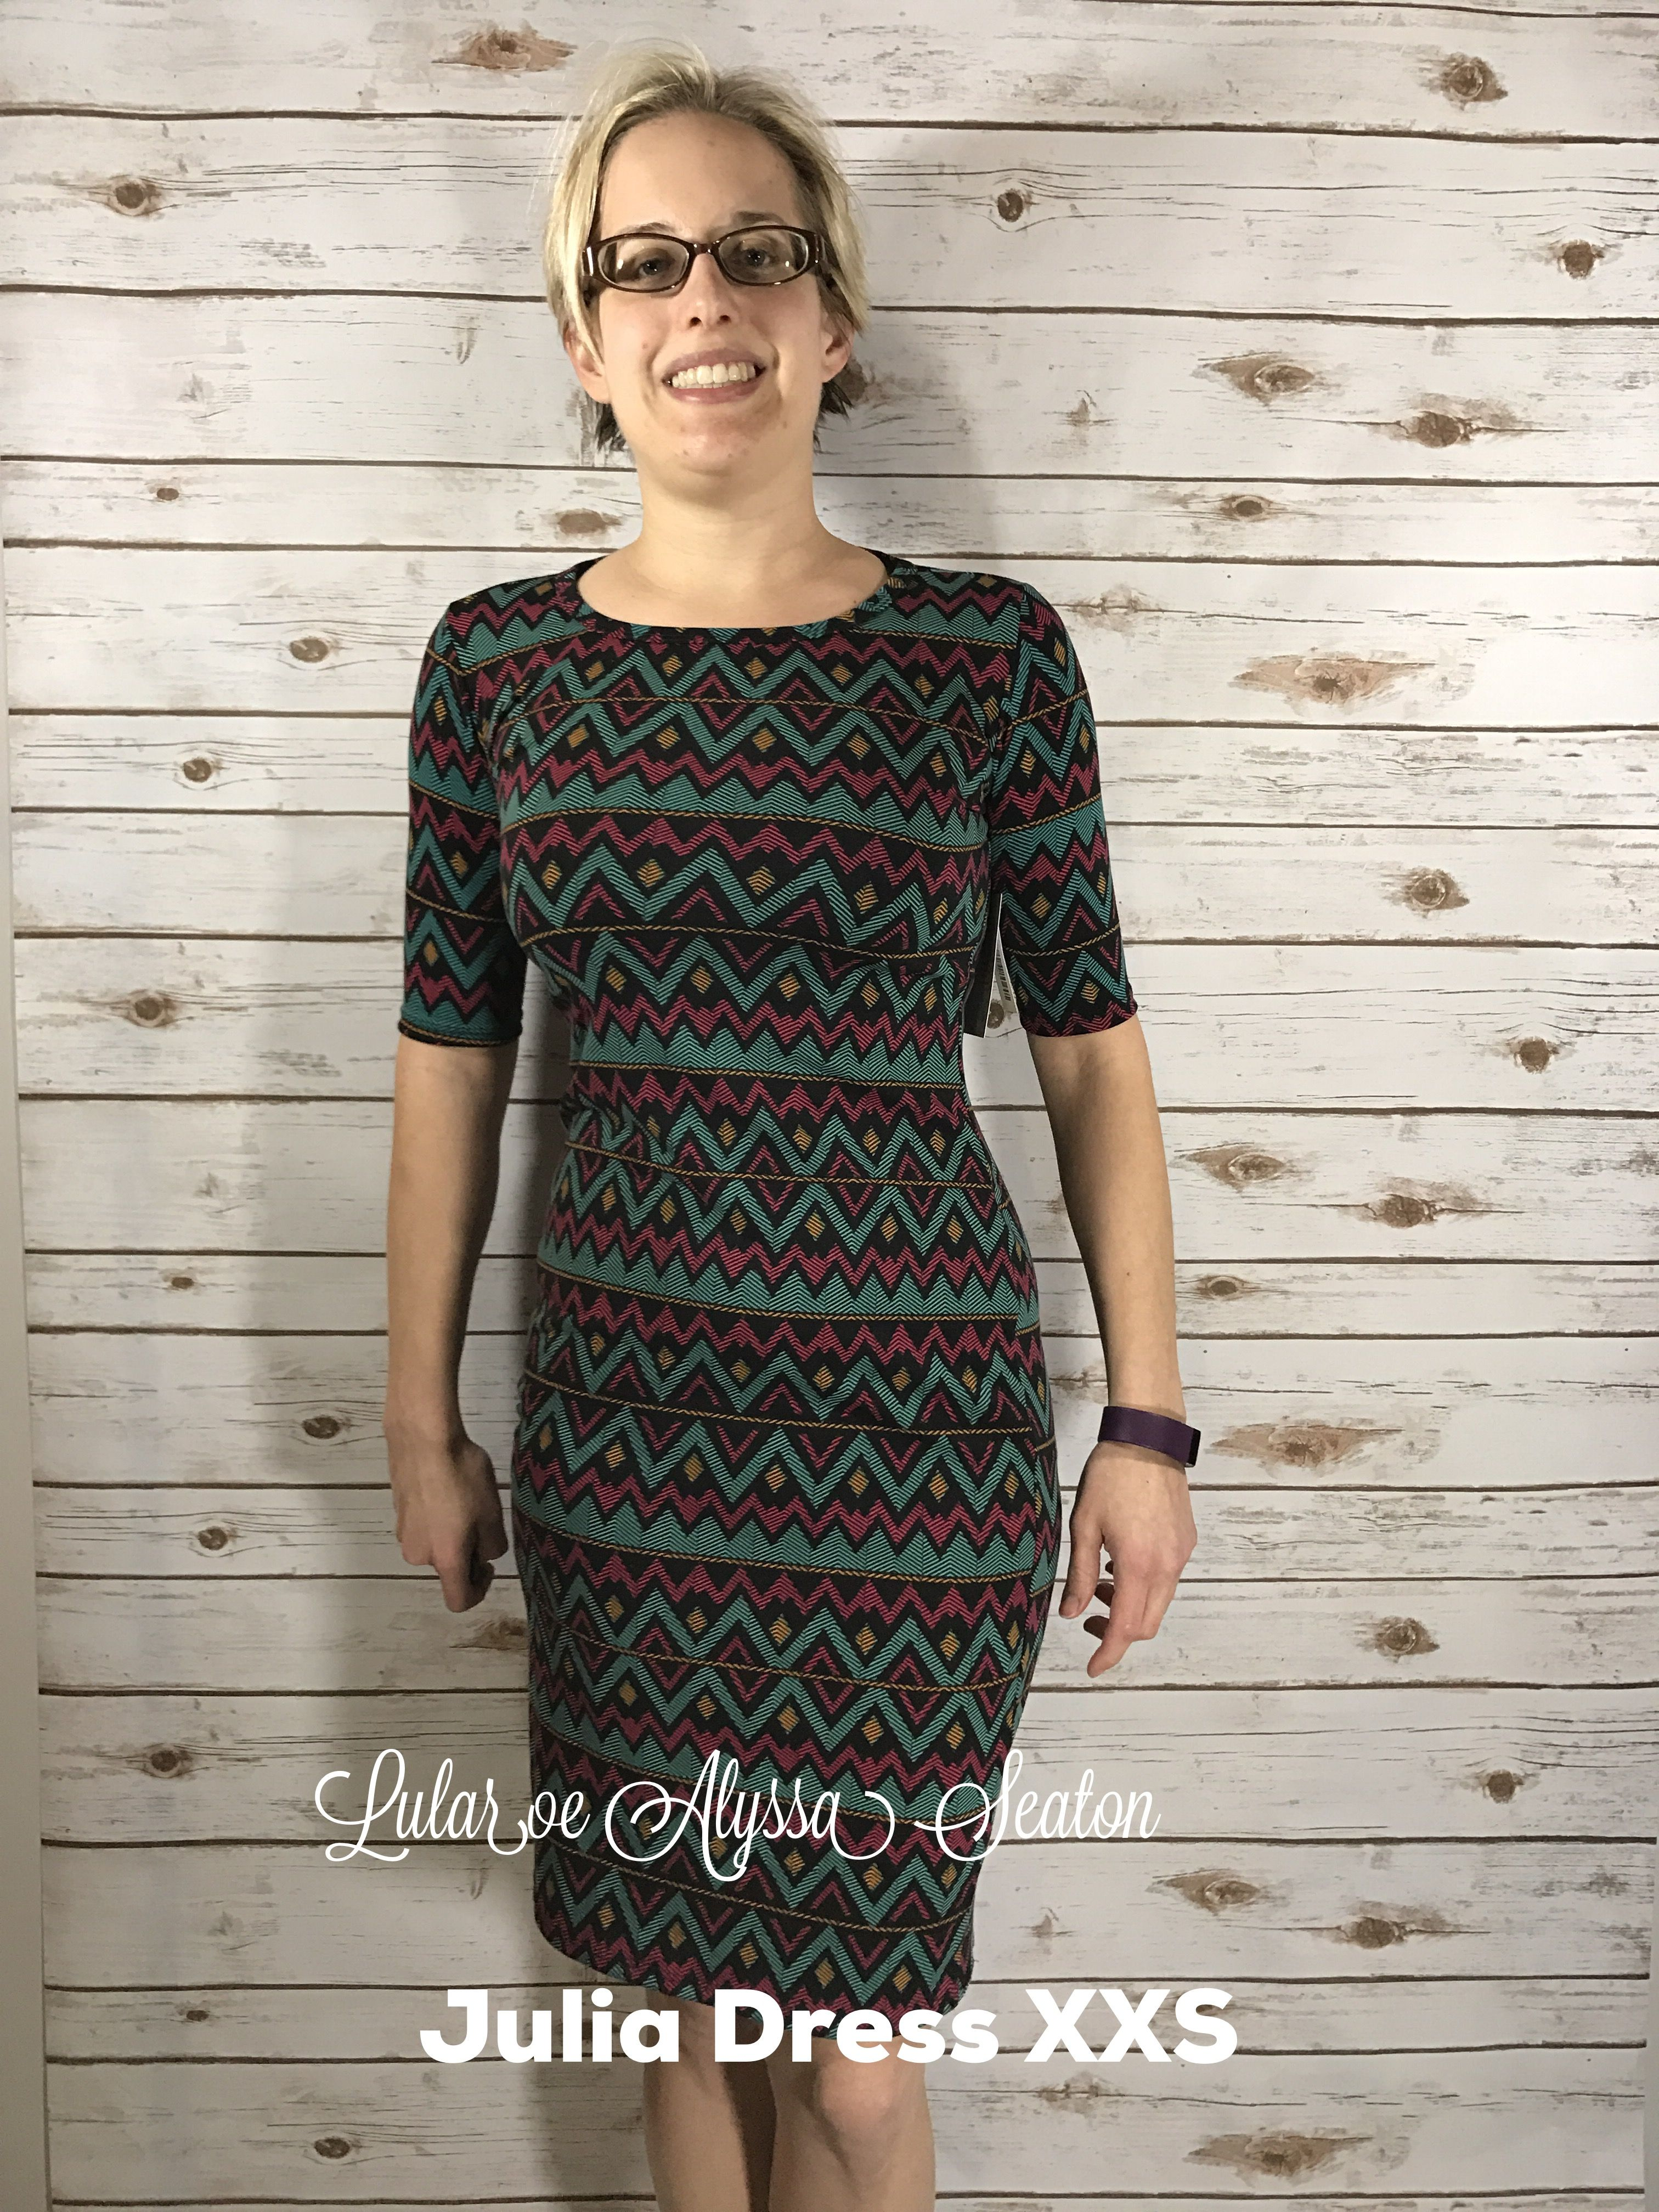 Julia Dress XXS Available at https://m.facebook.com/groups/1819416091614981